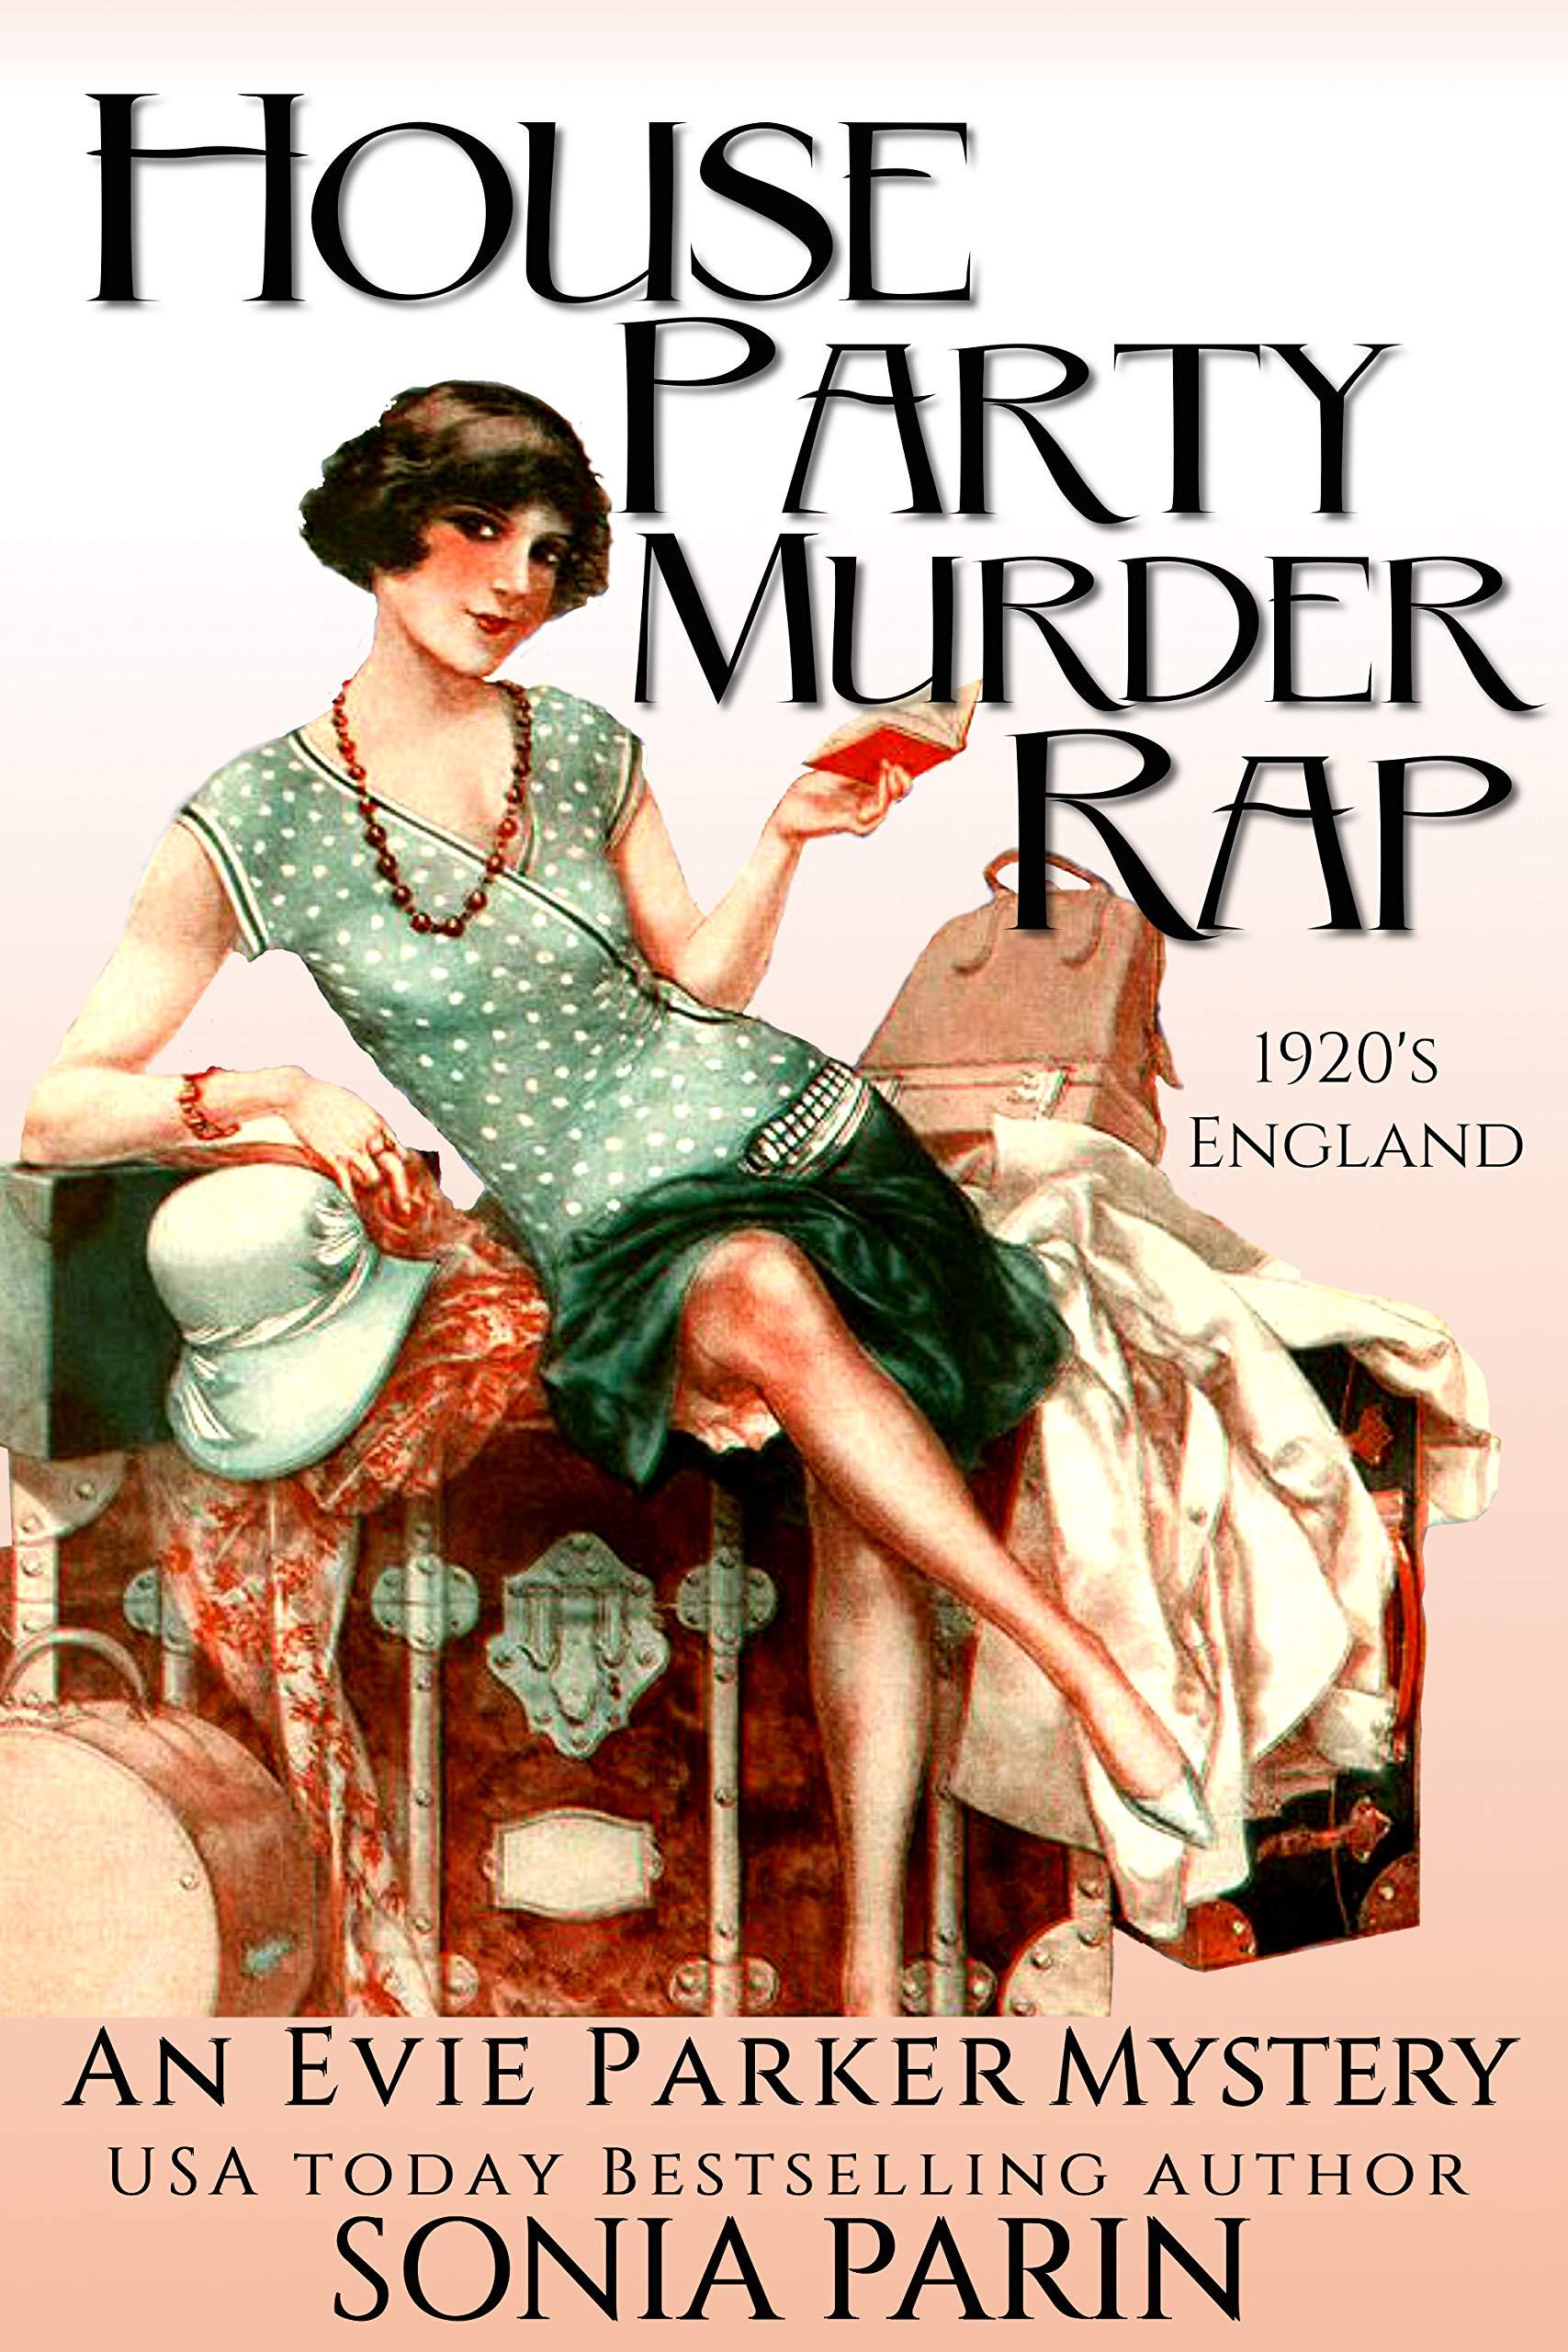 House Party Murder Rap: 1920s Historical Cozy Mystery (An Evie Parker Mystery Book 1) por Sonia Parin